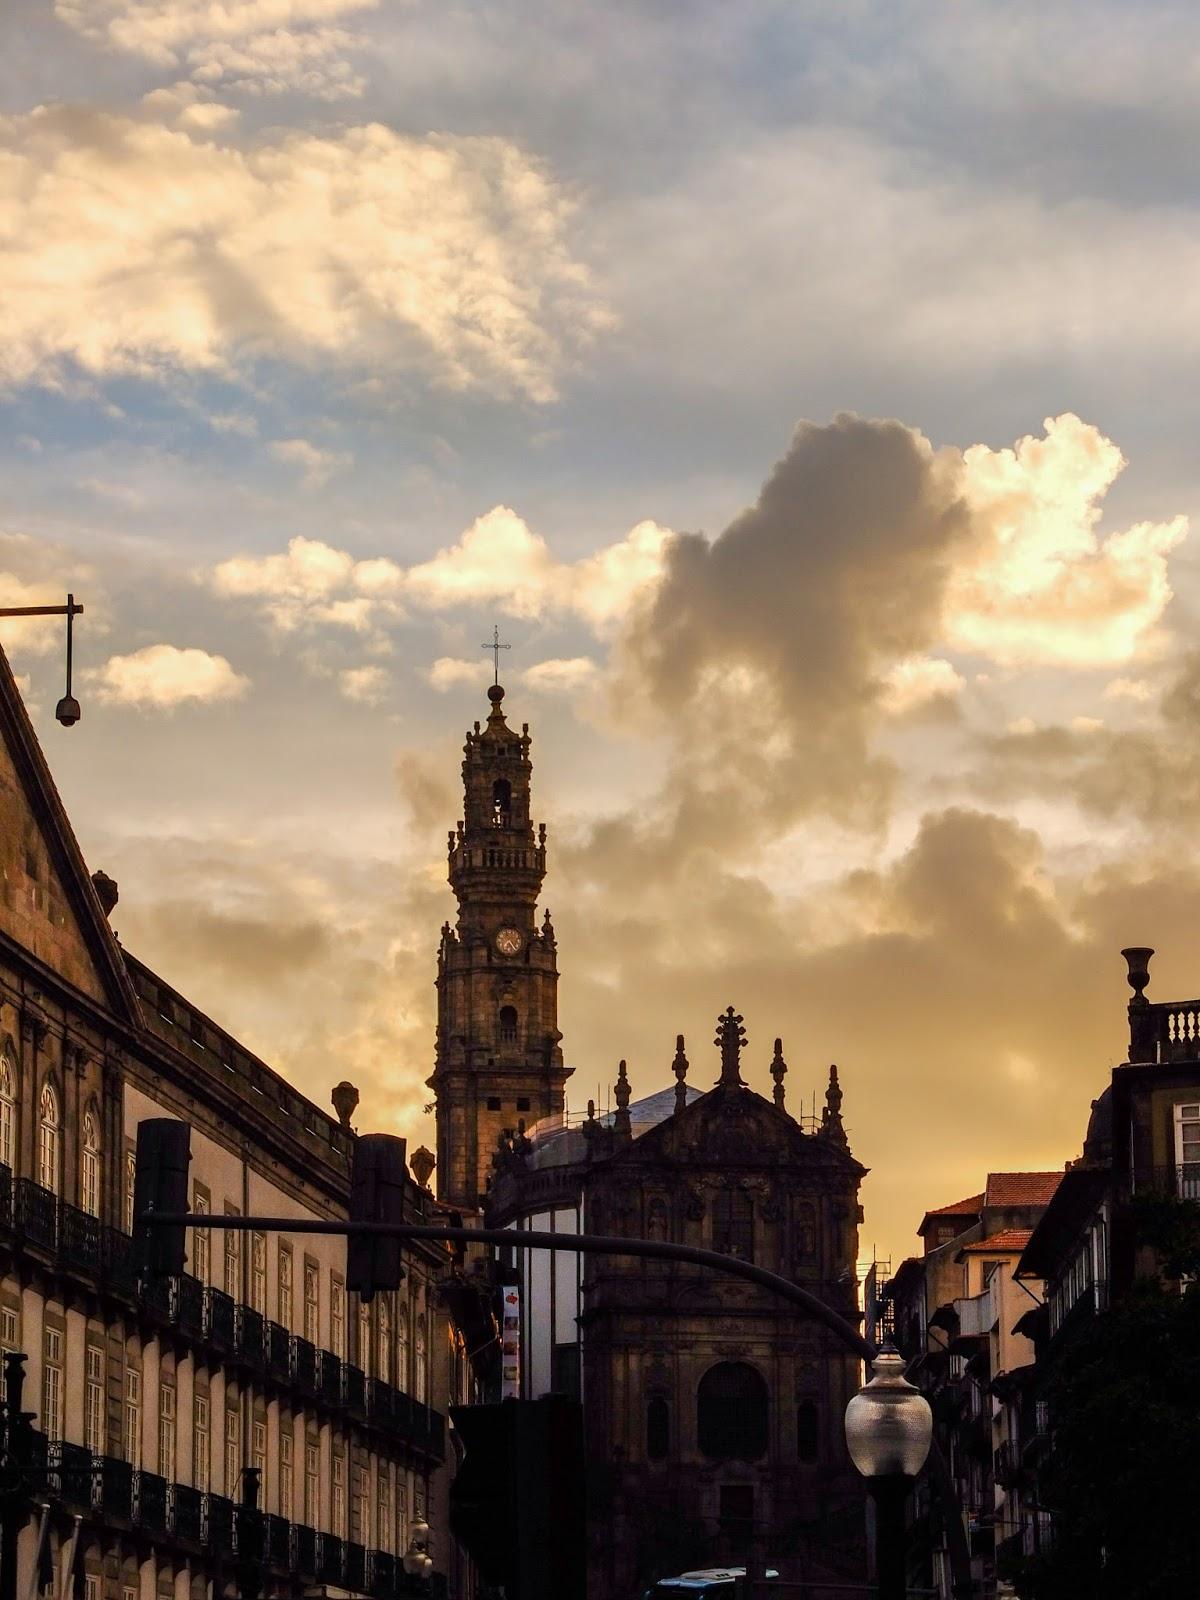 The Baroque 18th century Clérigos Church at sunset from Rua dos Clerigos in Porto, Portugal.